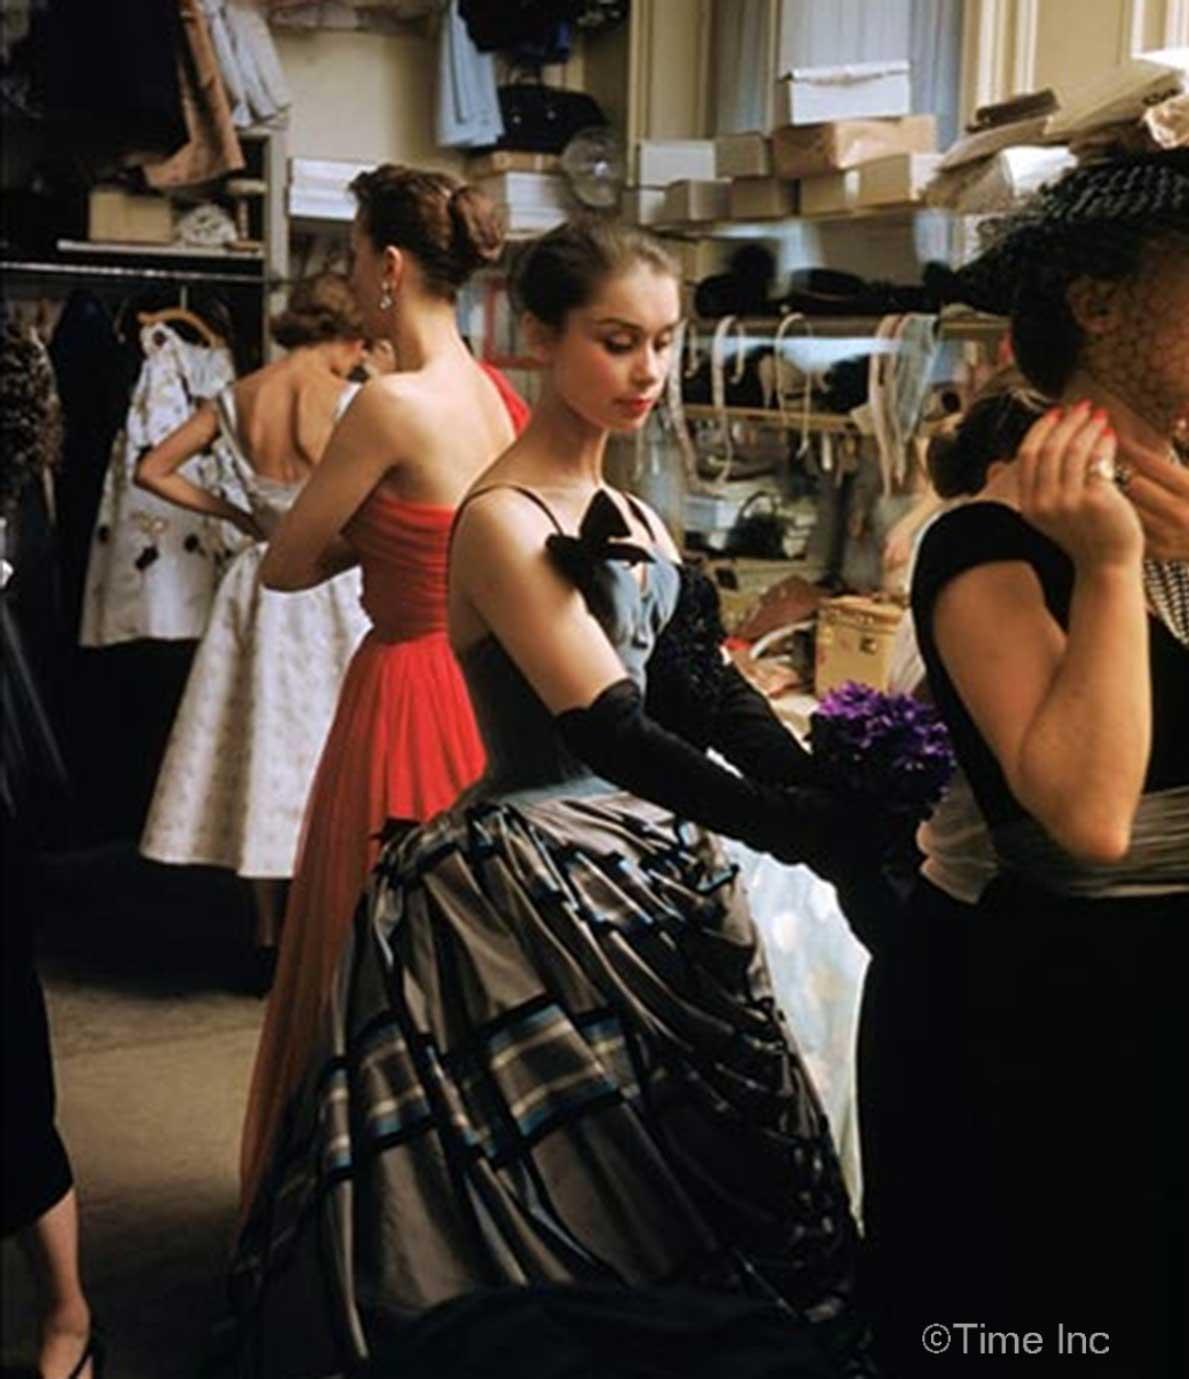 Balmain-1954--Backstage-Photos-of-1954-Paris-Fall-Collection---Mark-Shaw2